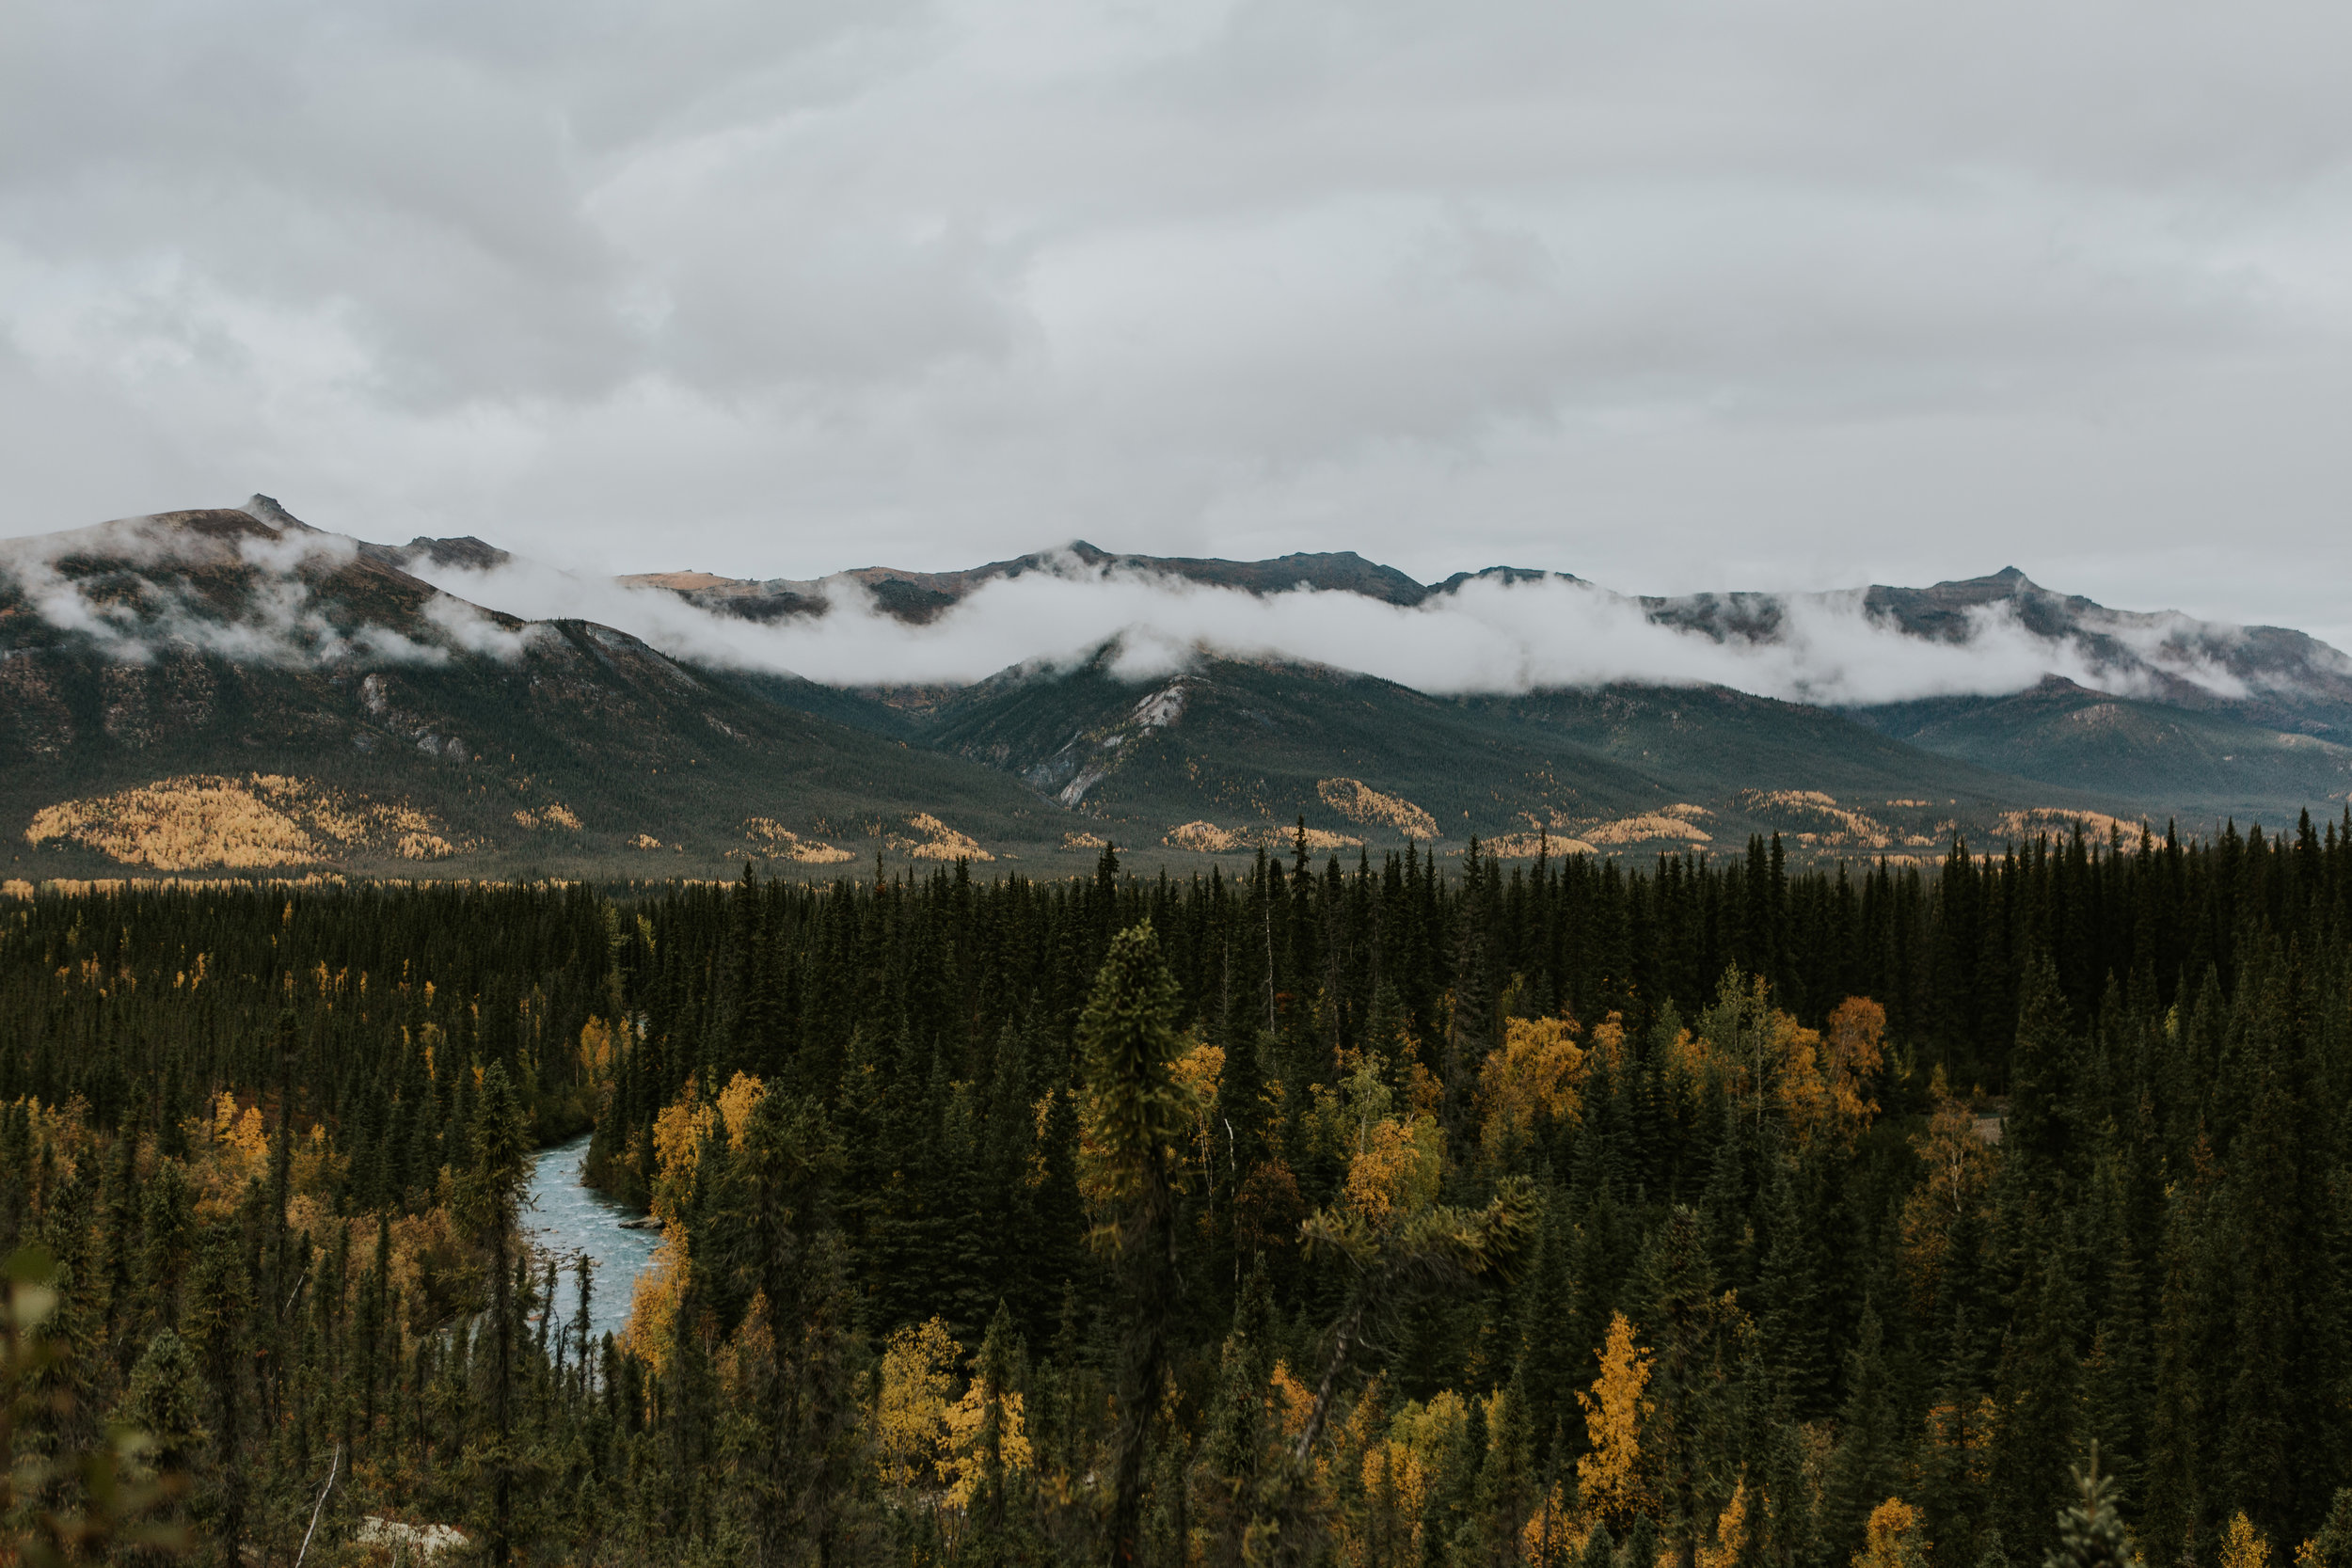 CindyGiovagnoli_Alaska_KoyukukRiver_SukakpakMountain_JimRiver_ArcticCircle_fly_fishing_September-028.jpg